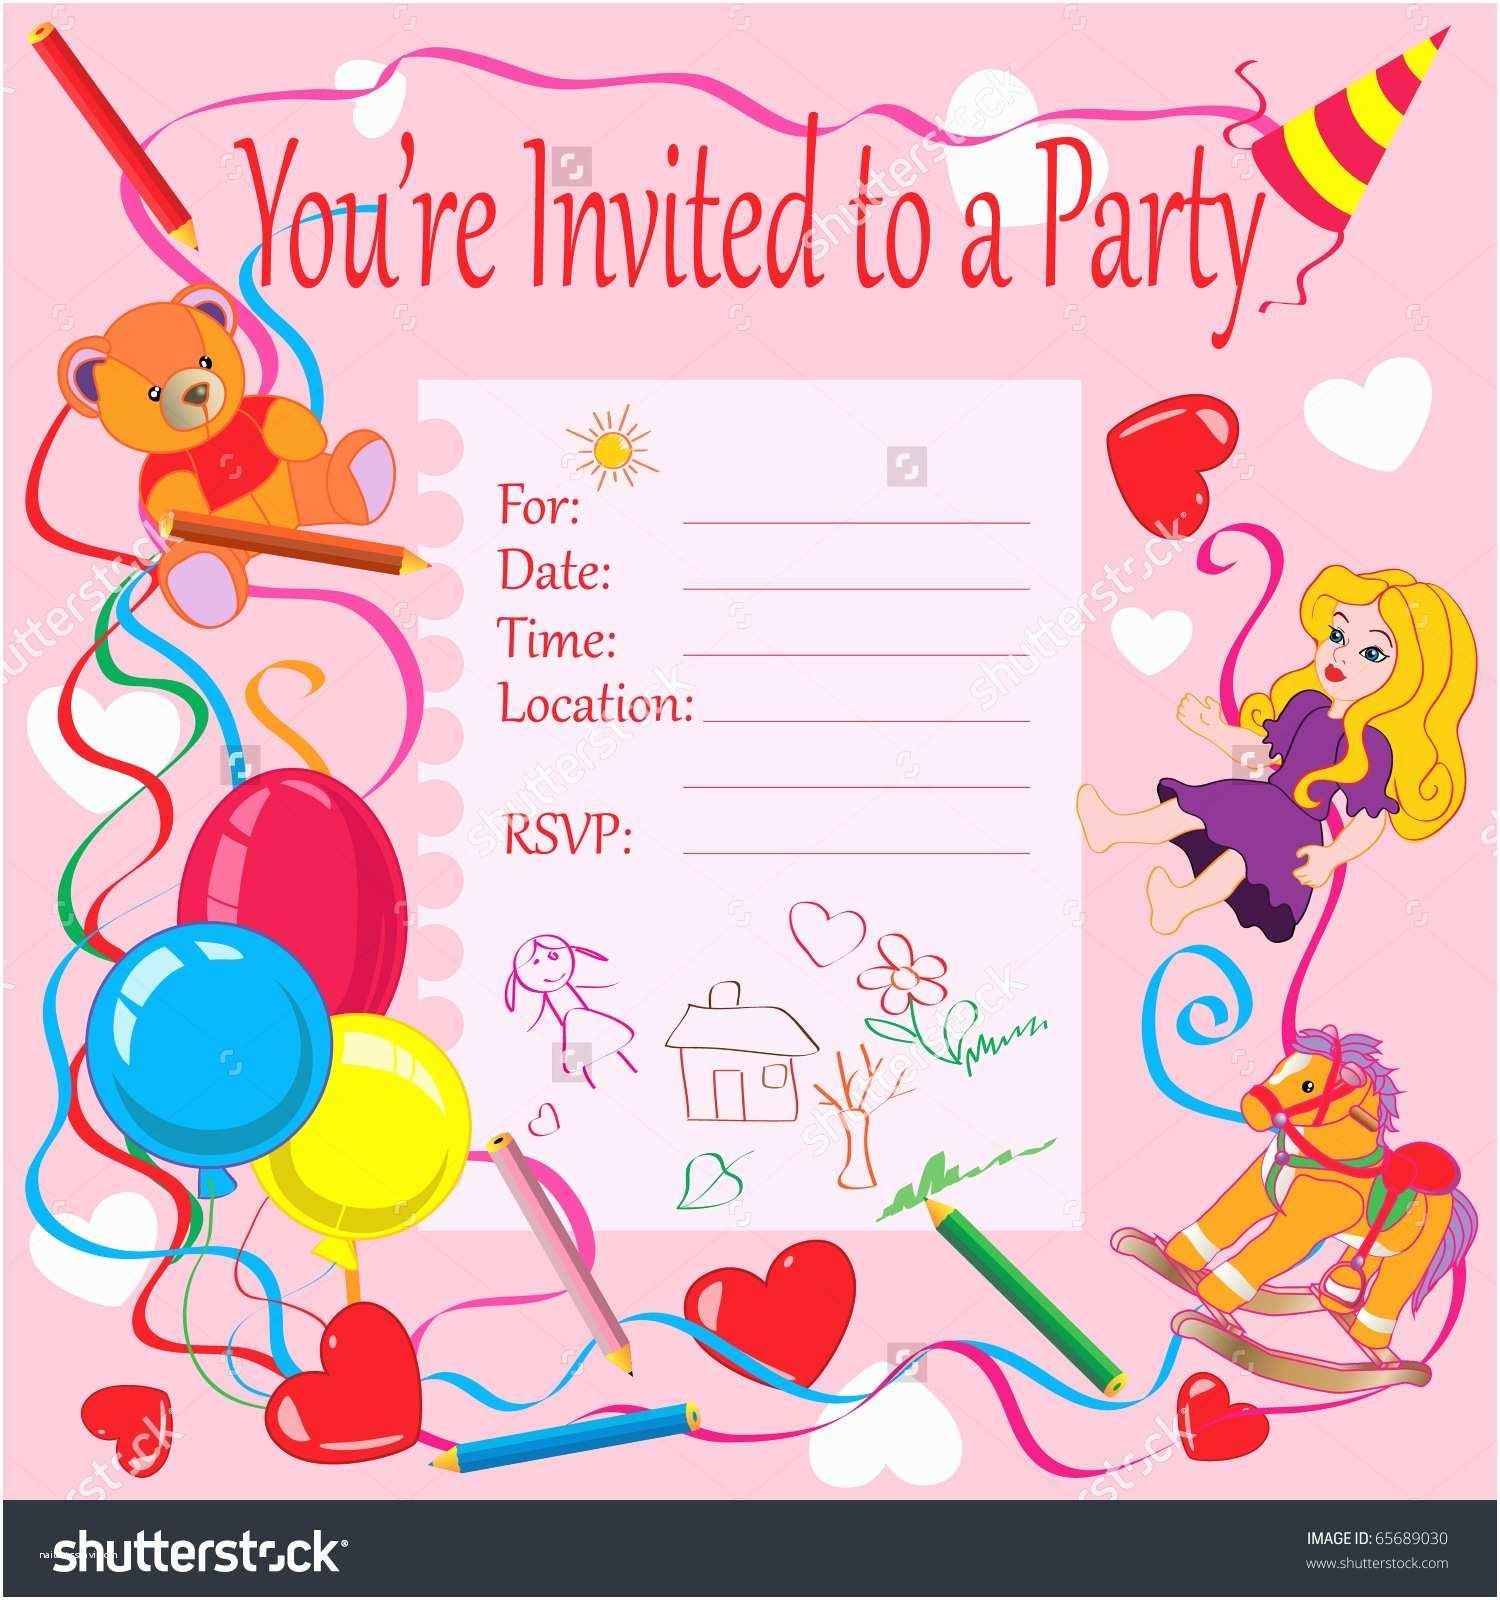 Party Invitation Ideas Card Invitation Ideas Modern Sample Wedding Invitation